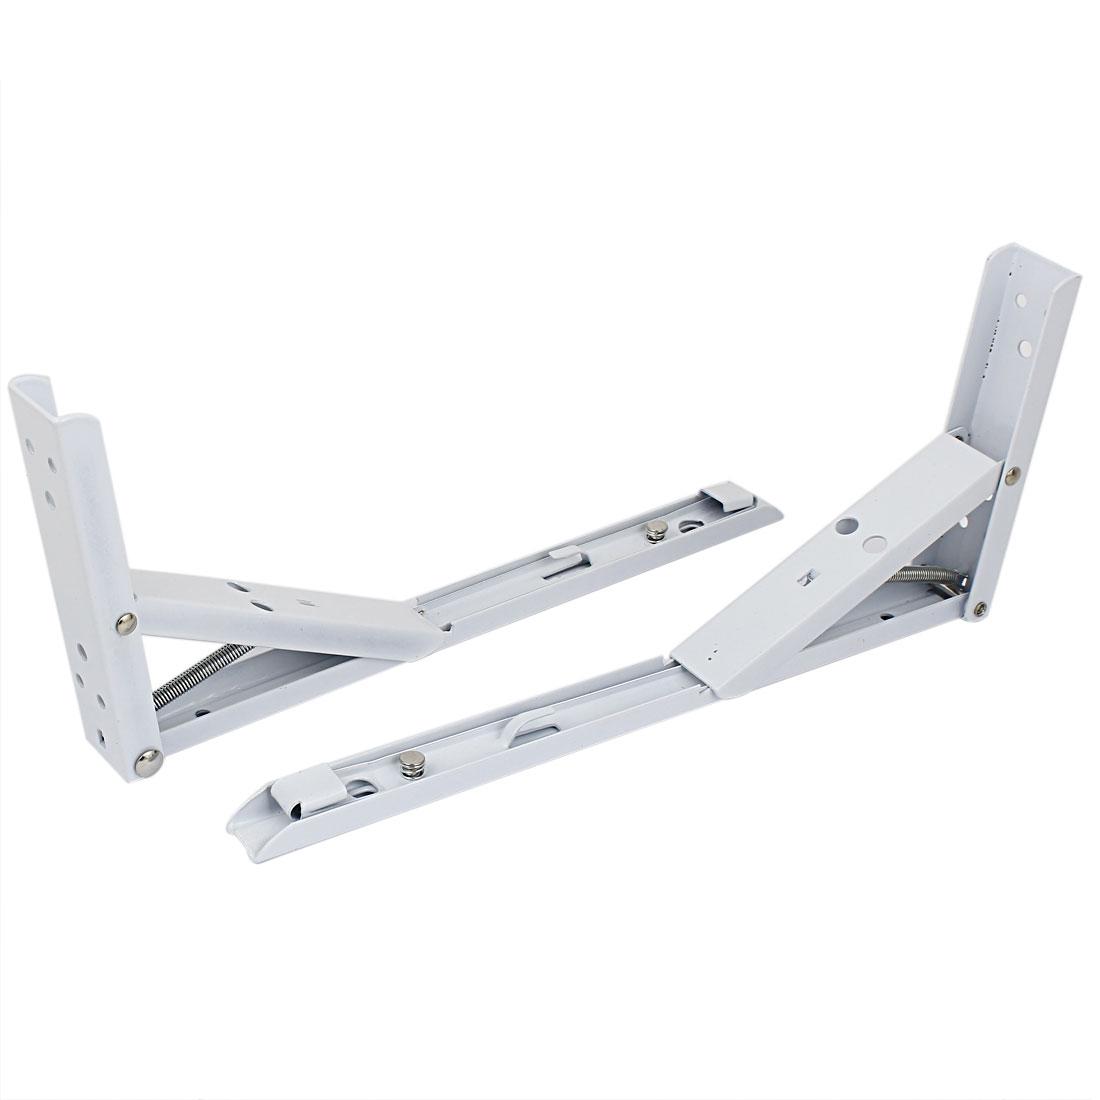 "Kitchen Counter 90 Degree L Shaped Folding Shelf Bracket 12"" Long 2 Pcs"